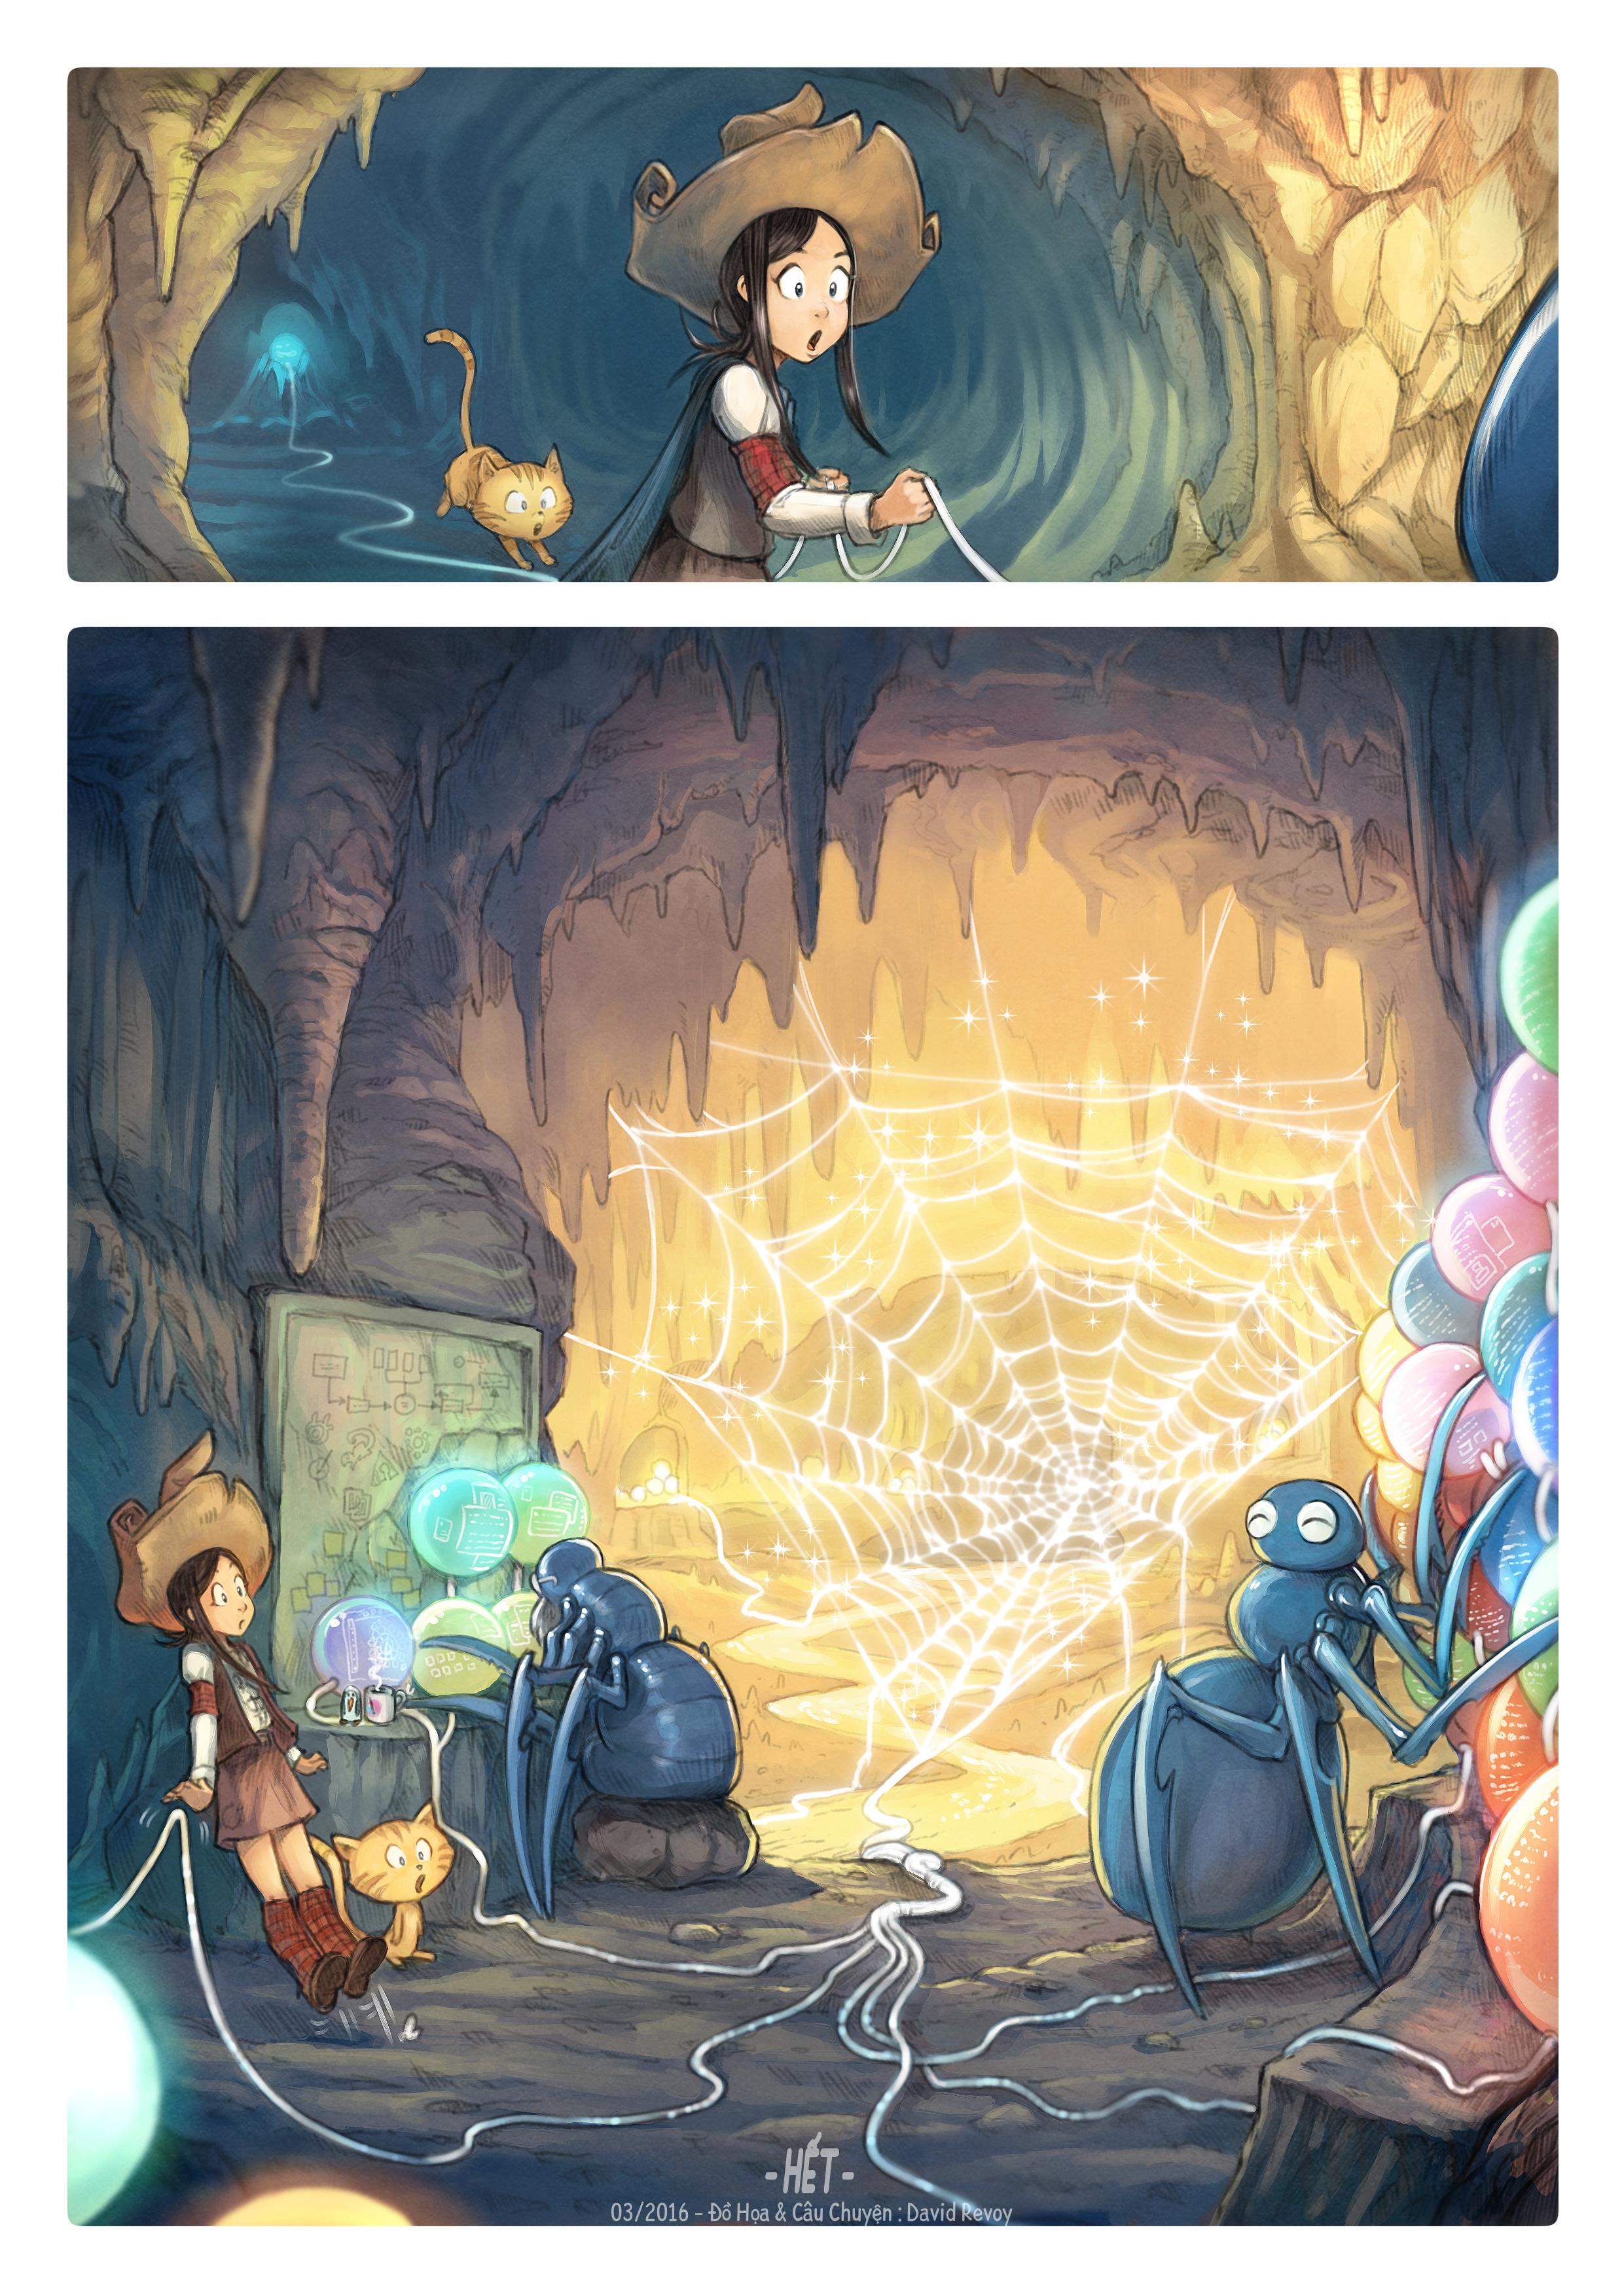 A webcomic page of Pepper&Carrot, Tập 15 [vi], trang 8